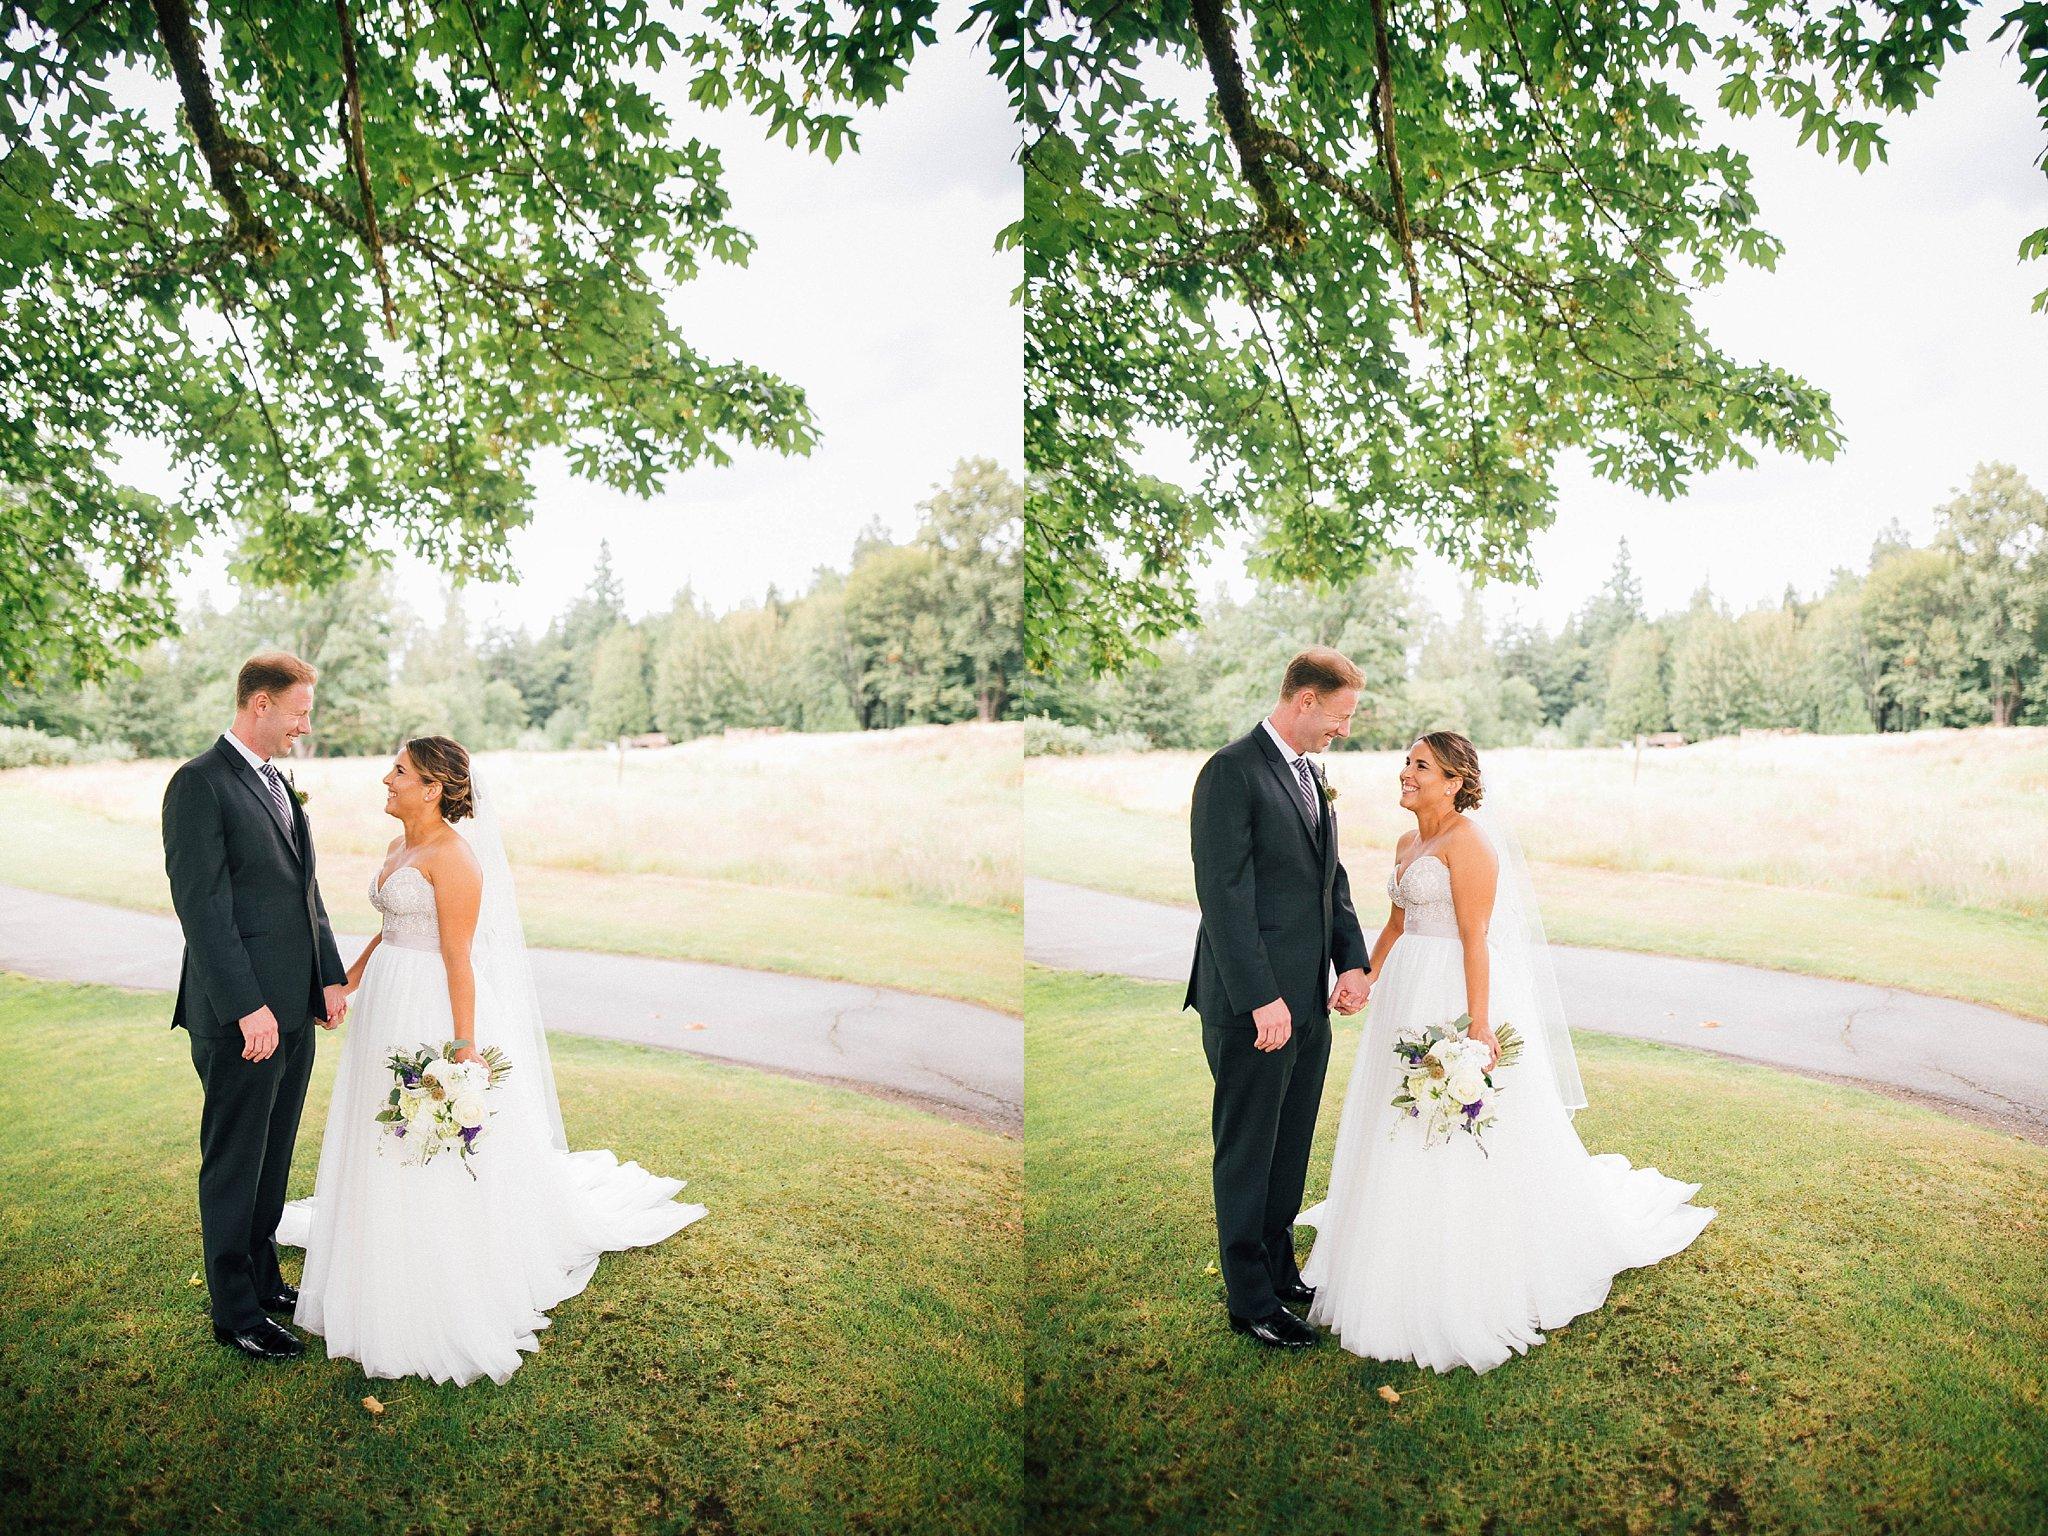 ashley_vos_seattle_wedding_photographer_0093.jpg